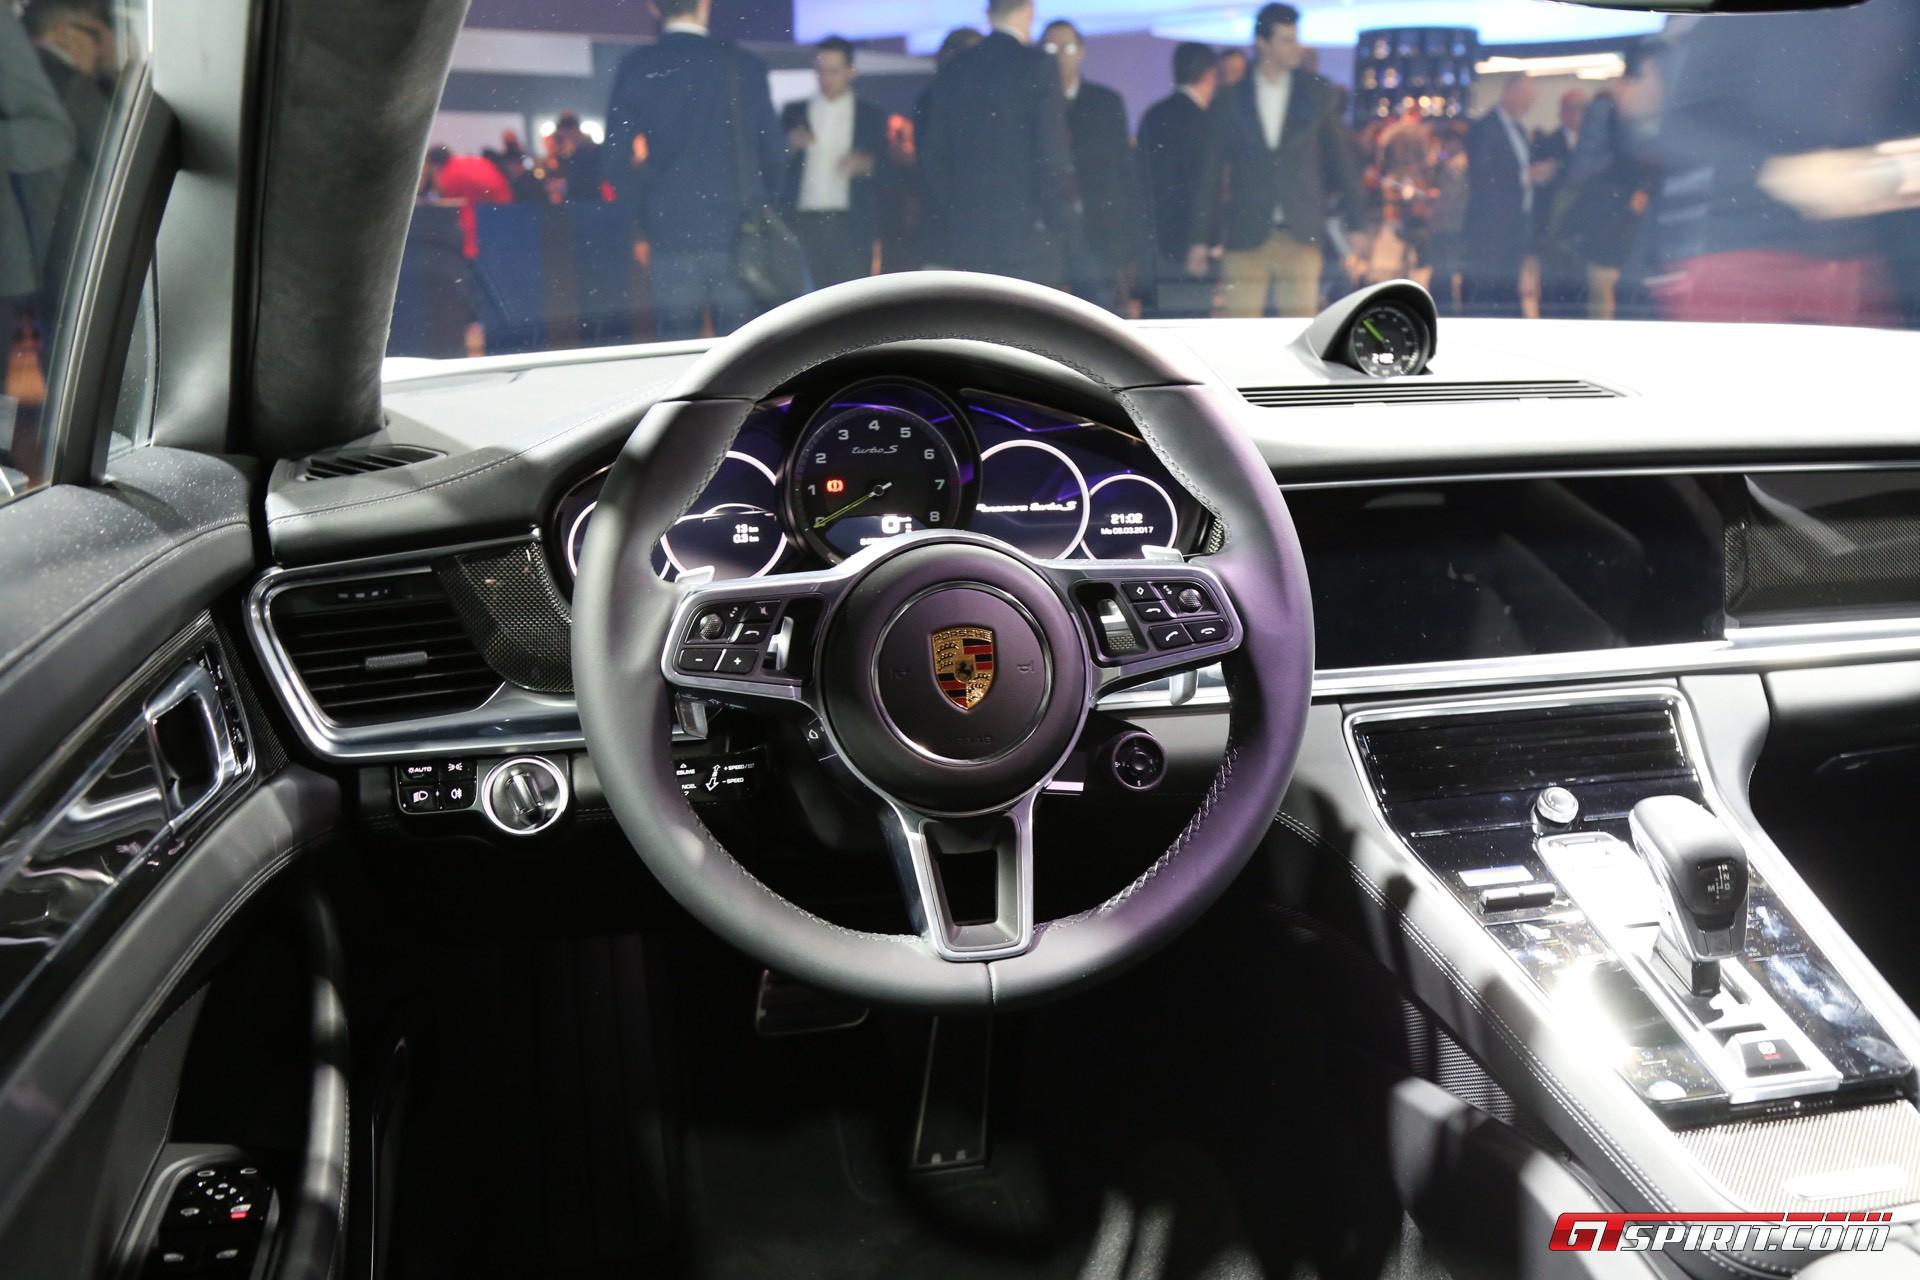 Porsche Panamera Turbo S E-Hybrid at Geneva 2017